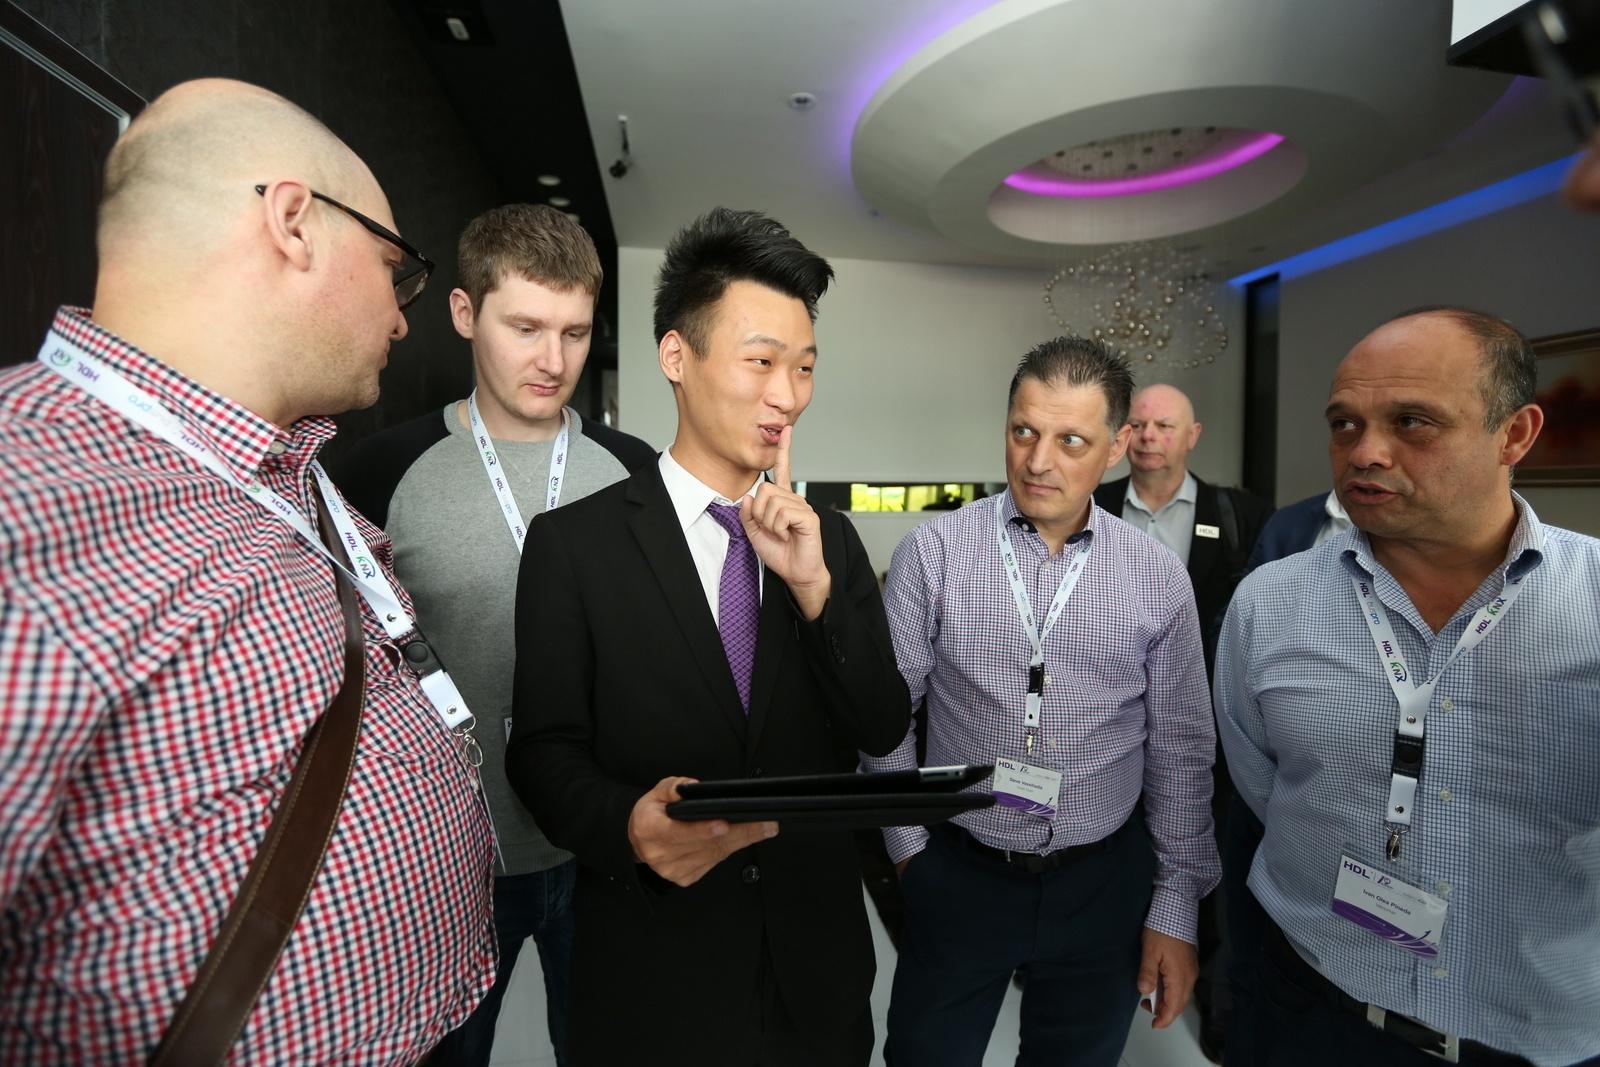 Китай. Завод устройств для «Умного дома». Учимся и учим - 17